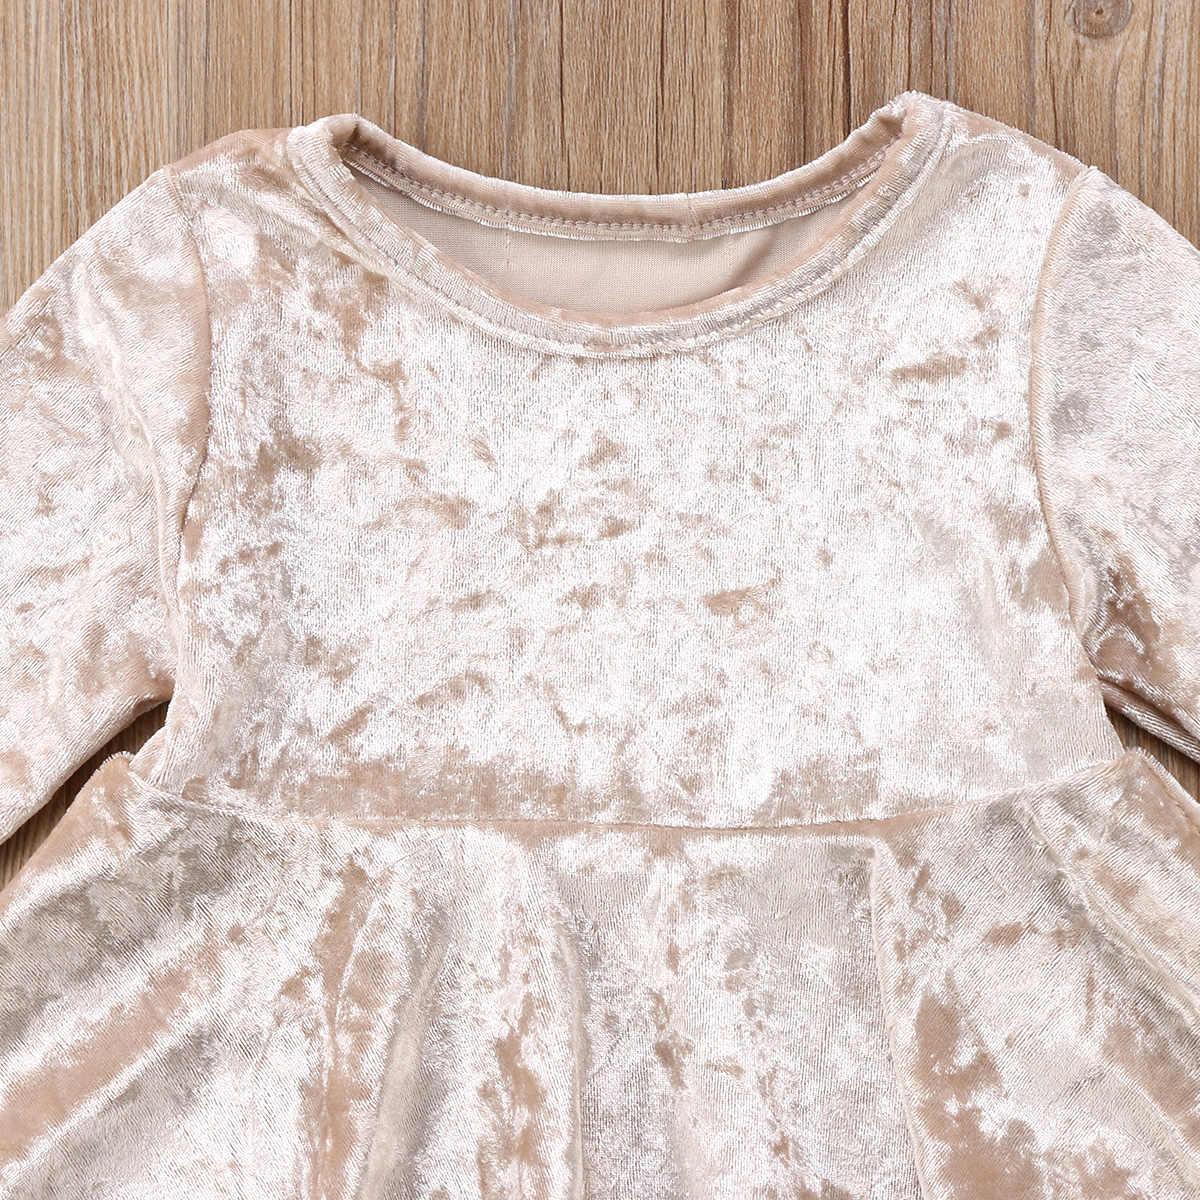 3dc6ff2ca420e Vintage Princess Kids Baby Flower Girls Dresses Velvet Tassel Party Dress  Gowns Babys Long Sleeve Round Neck Baby Clothing Sets